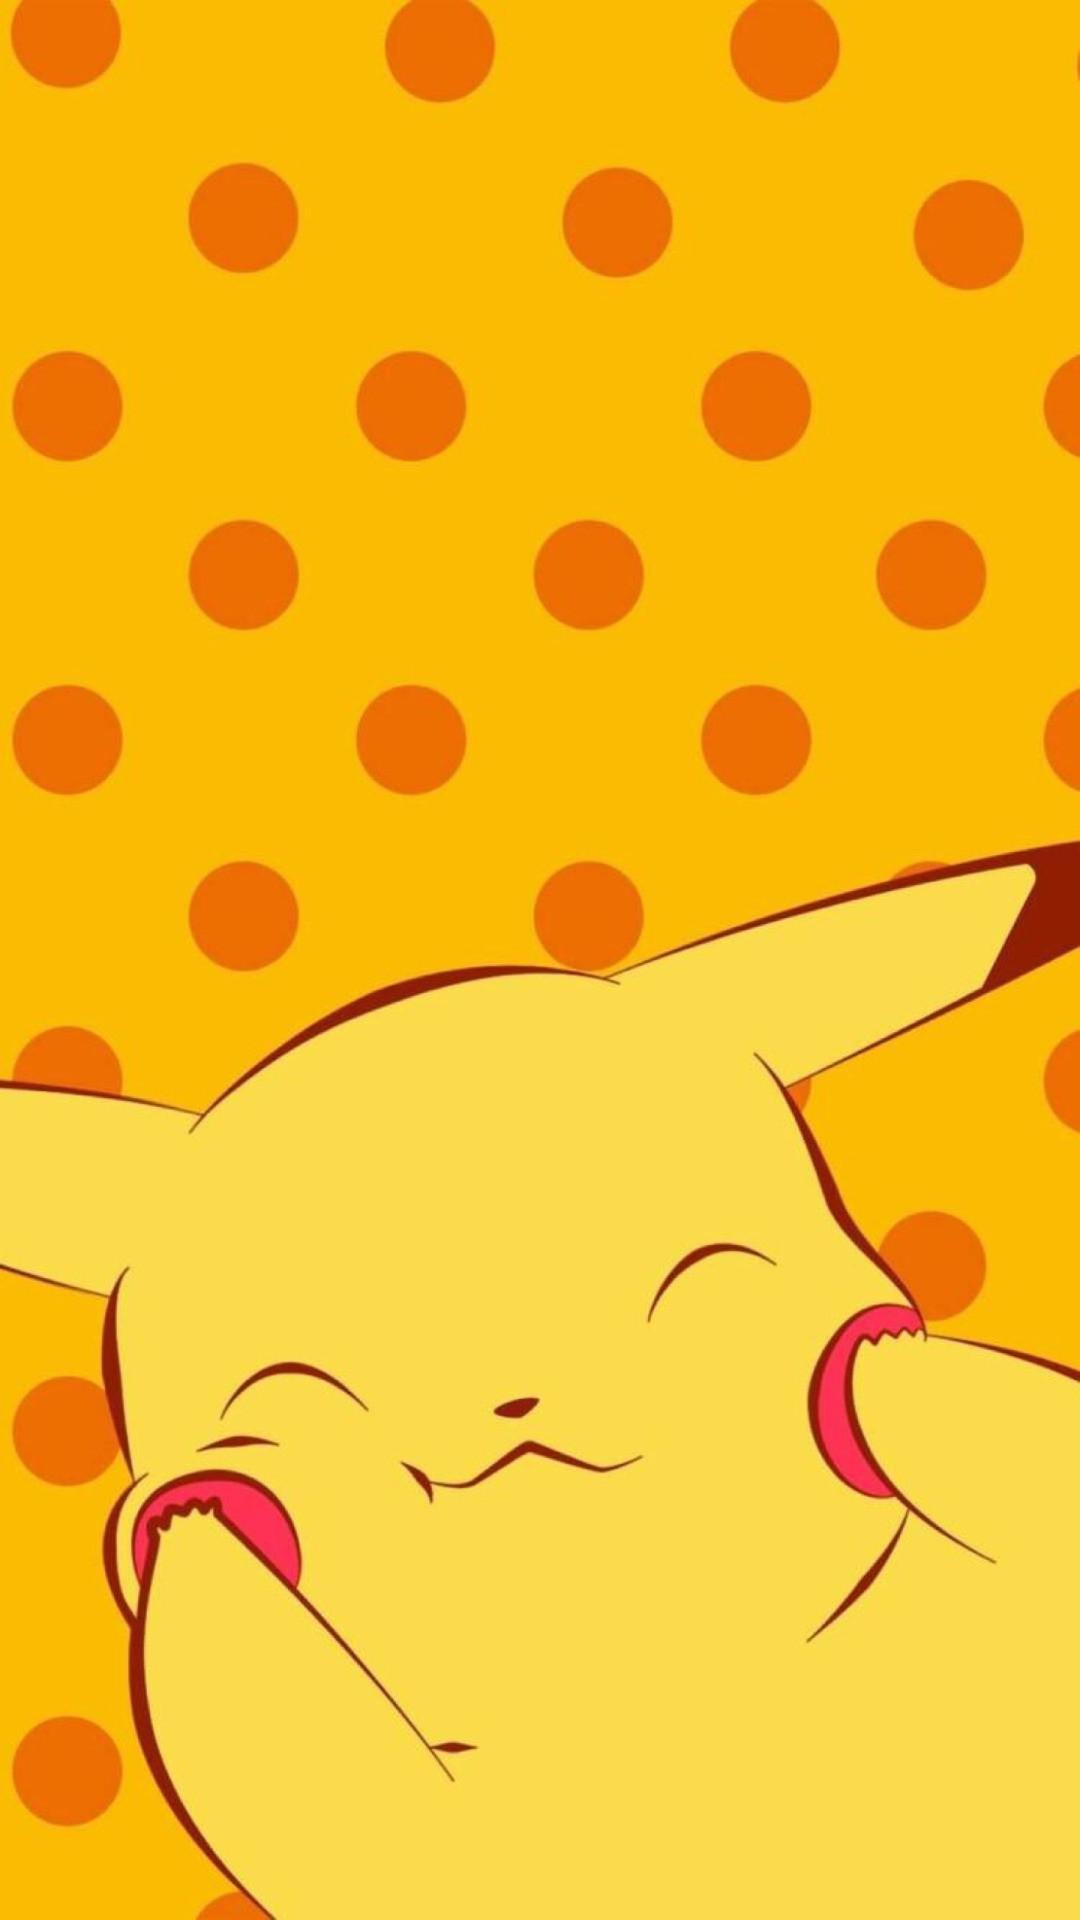 Pokemon iPhone Wallpaper Images Download.